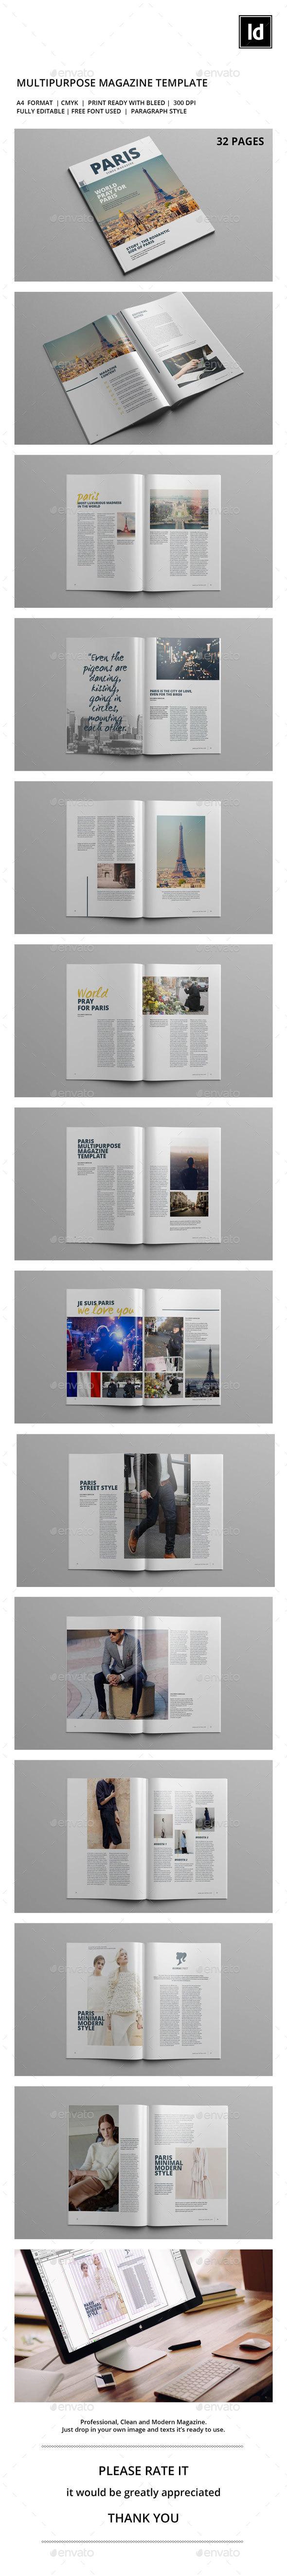 Paris Magazine - Magazines Print Templates